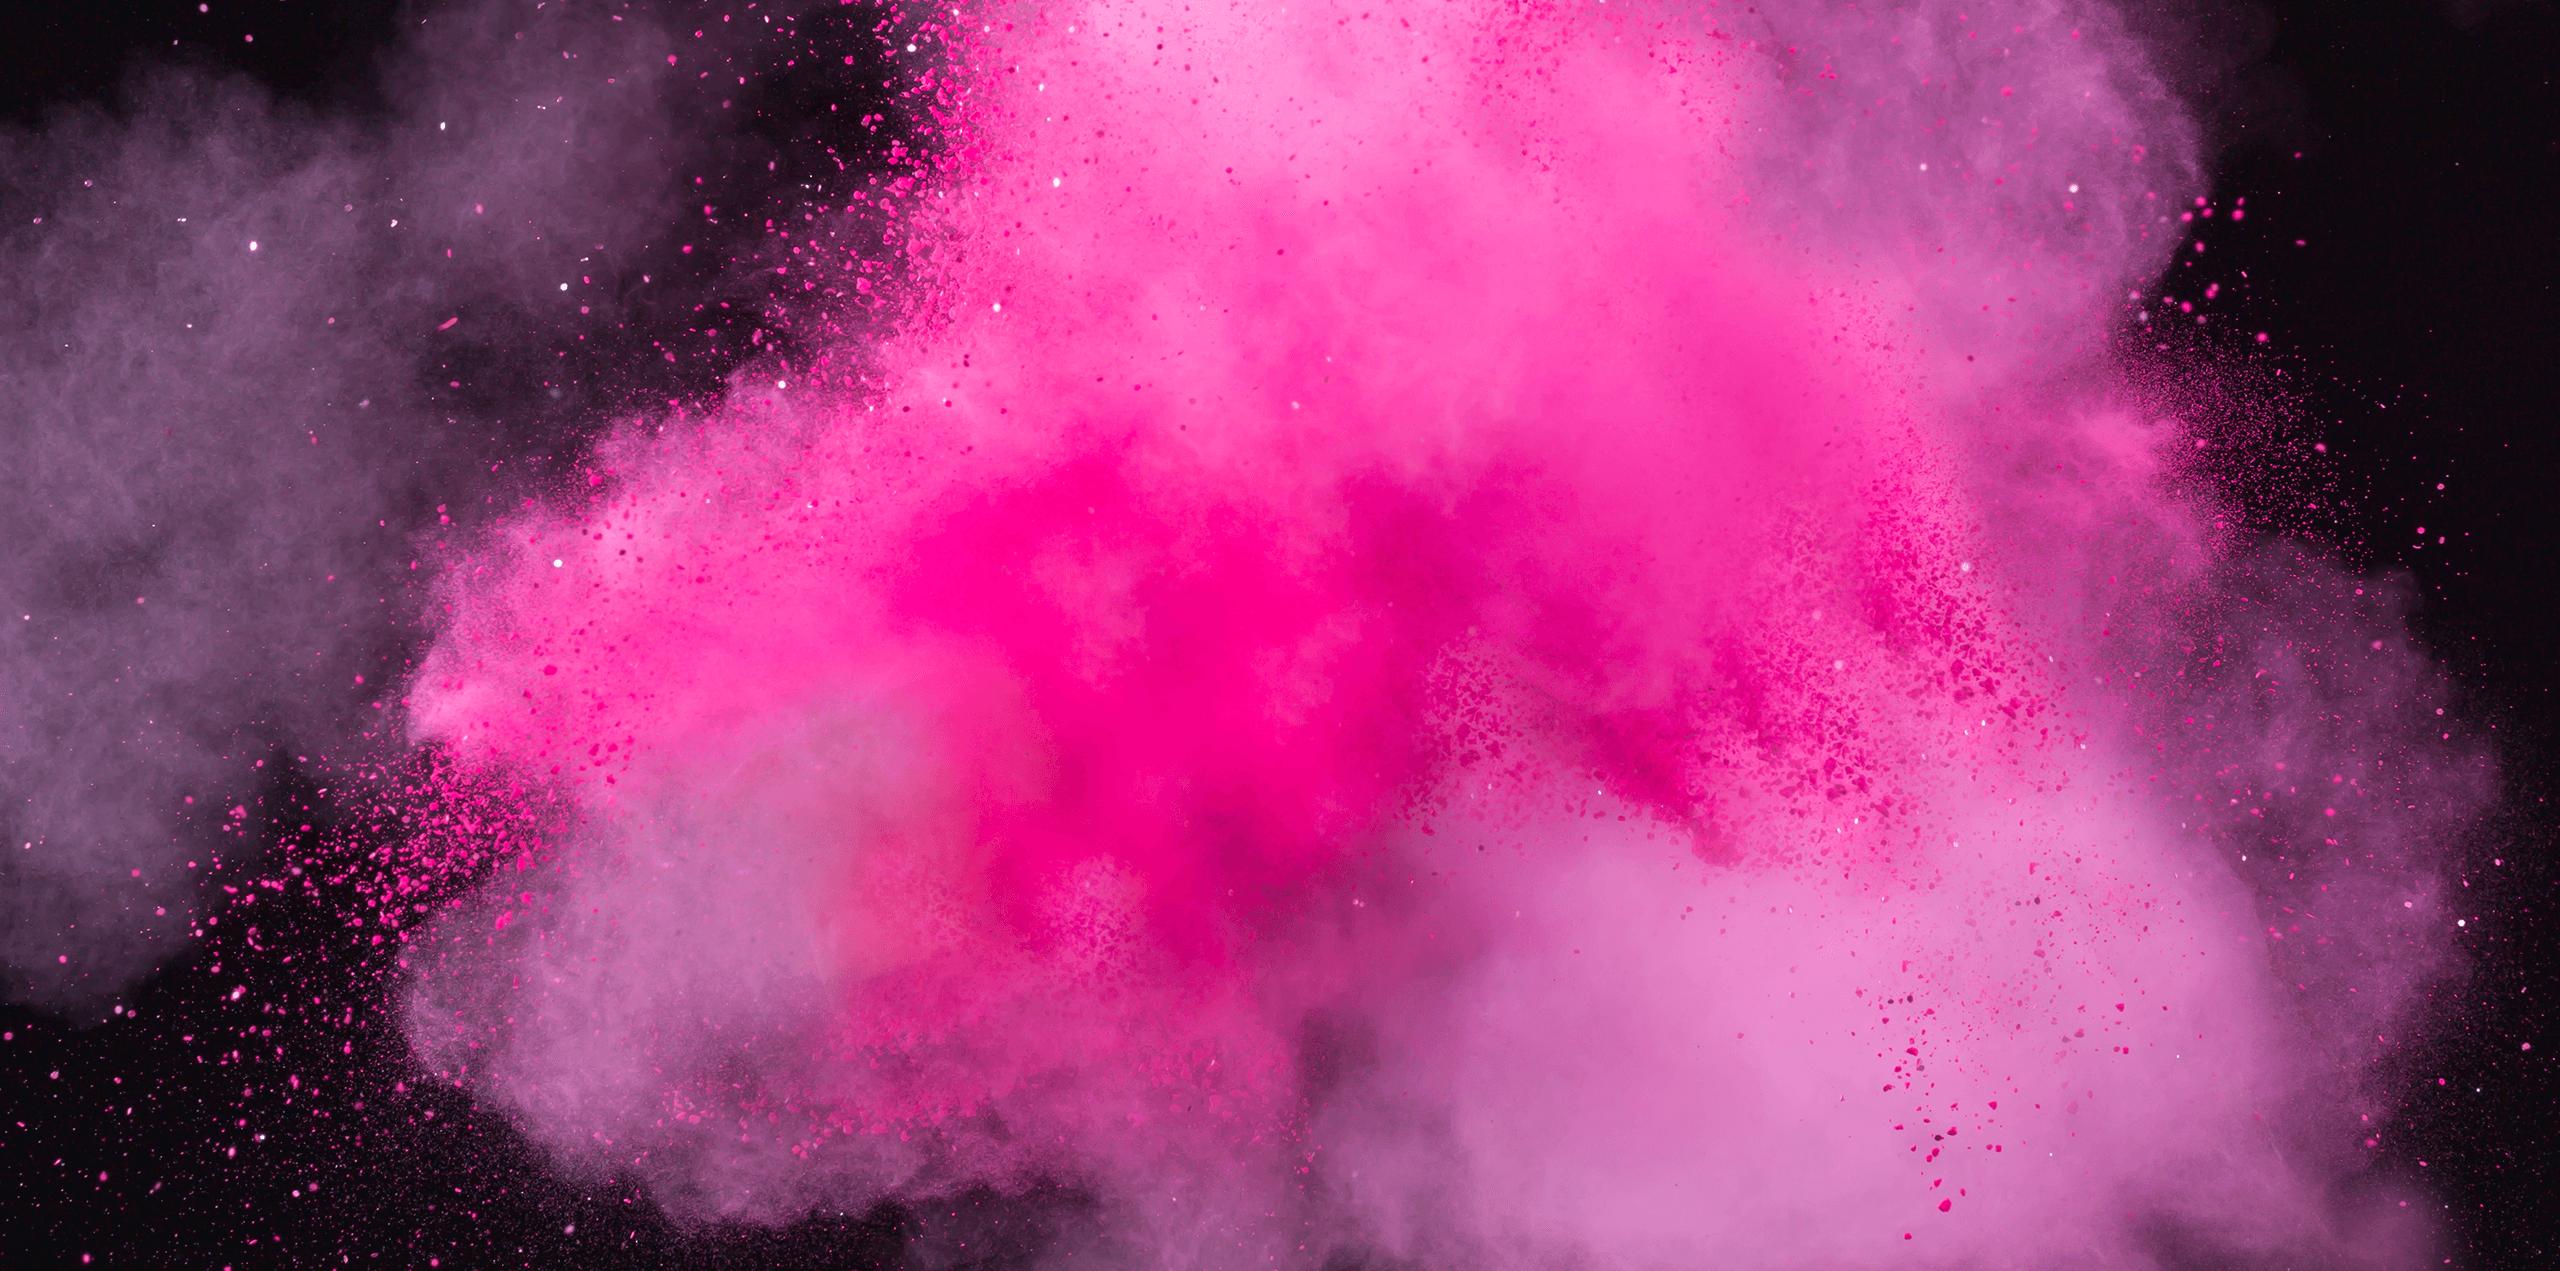 maybelline-colorjolt-heroimage-2